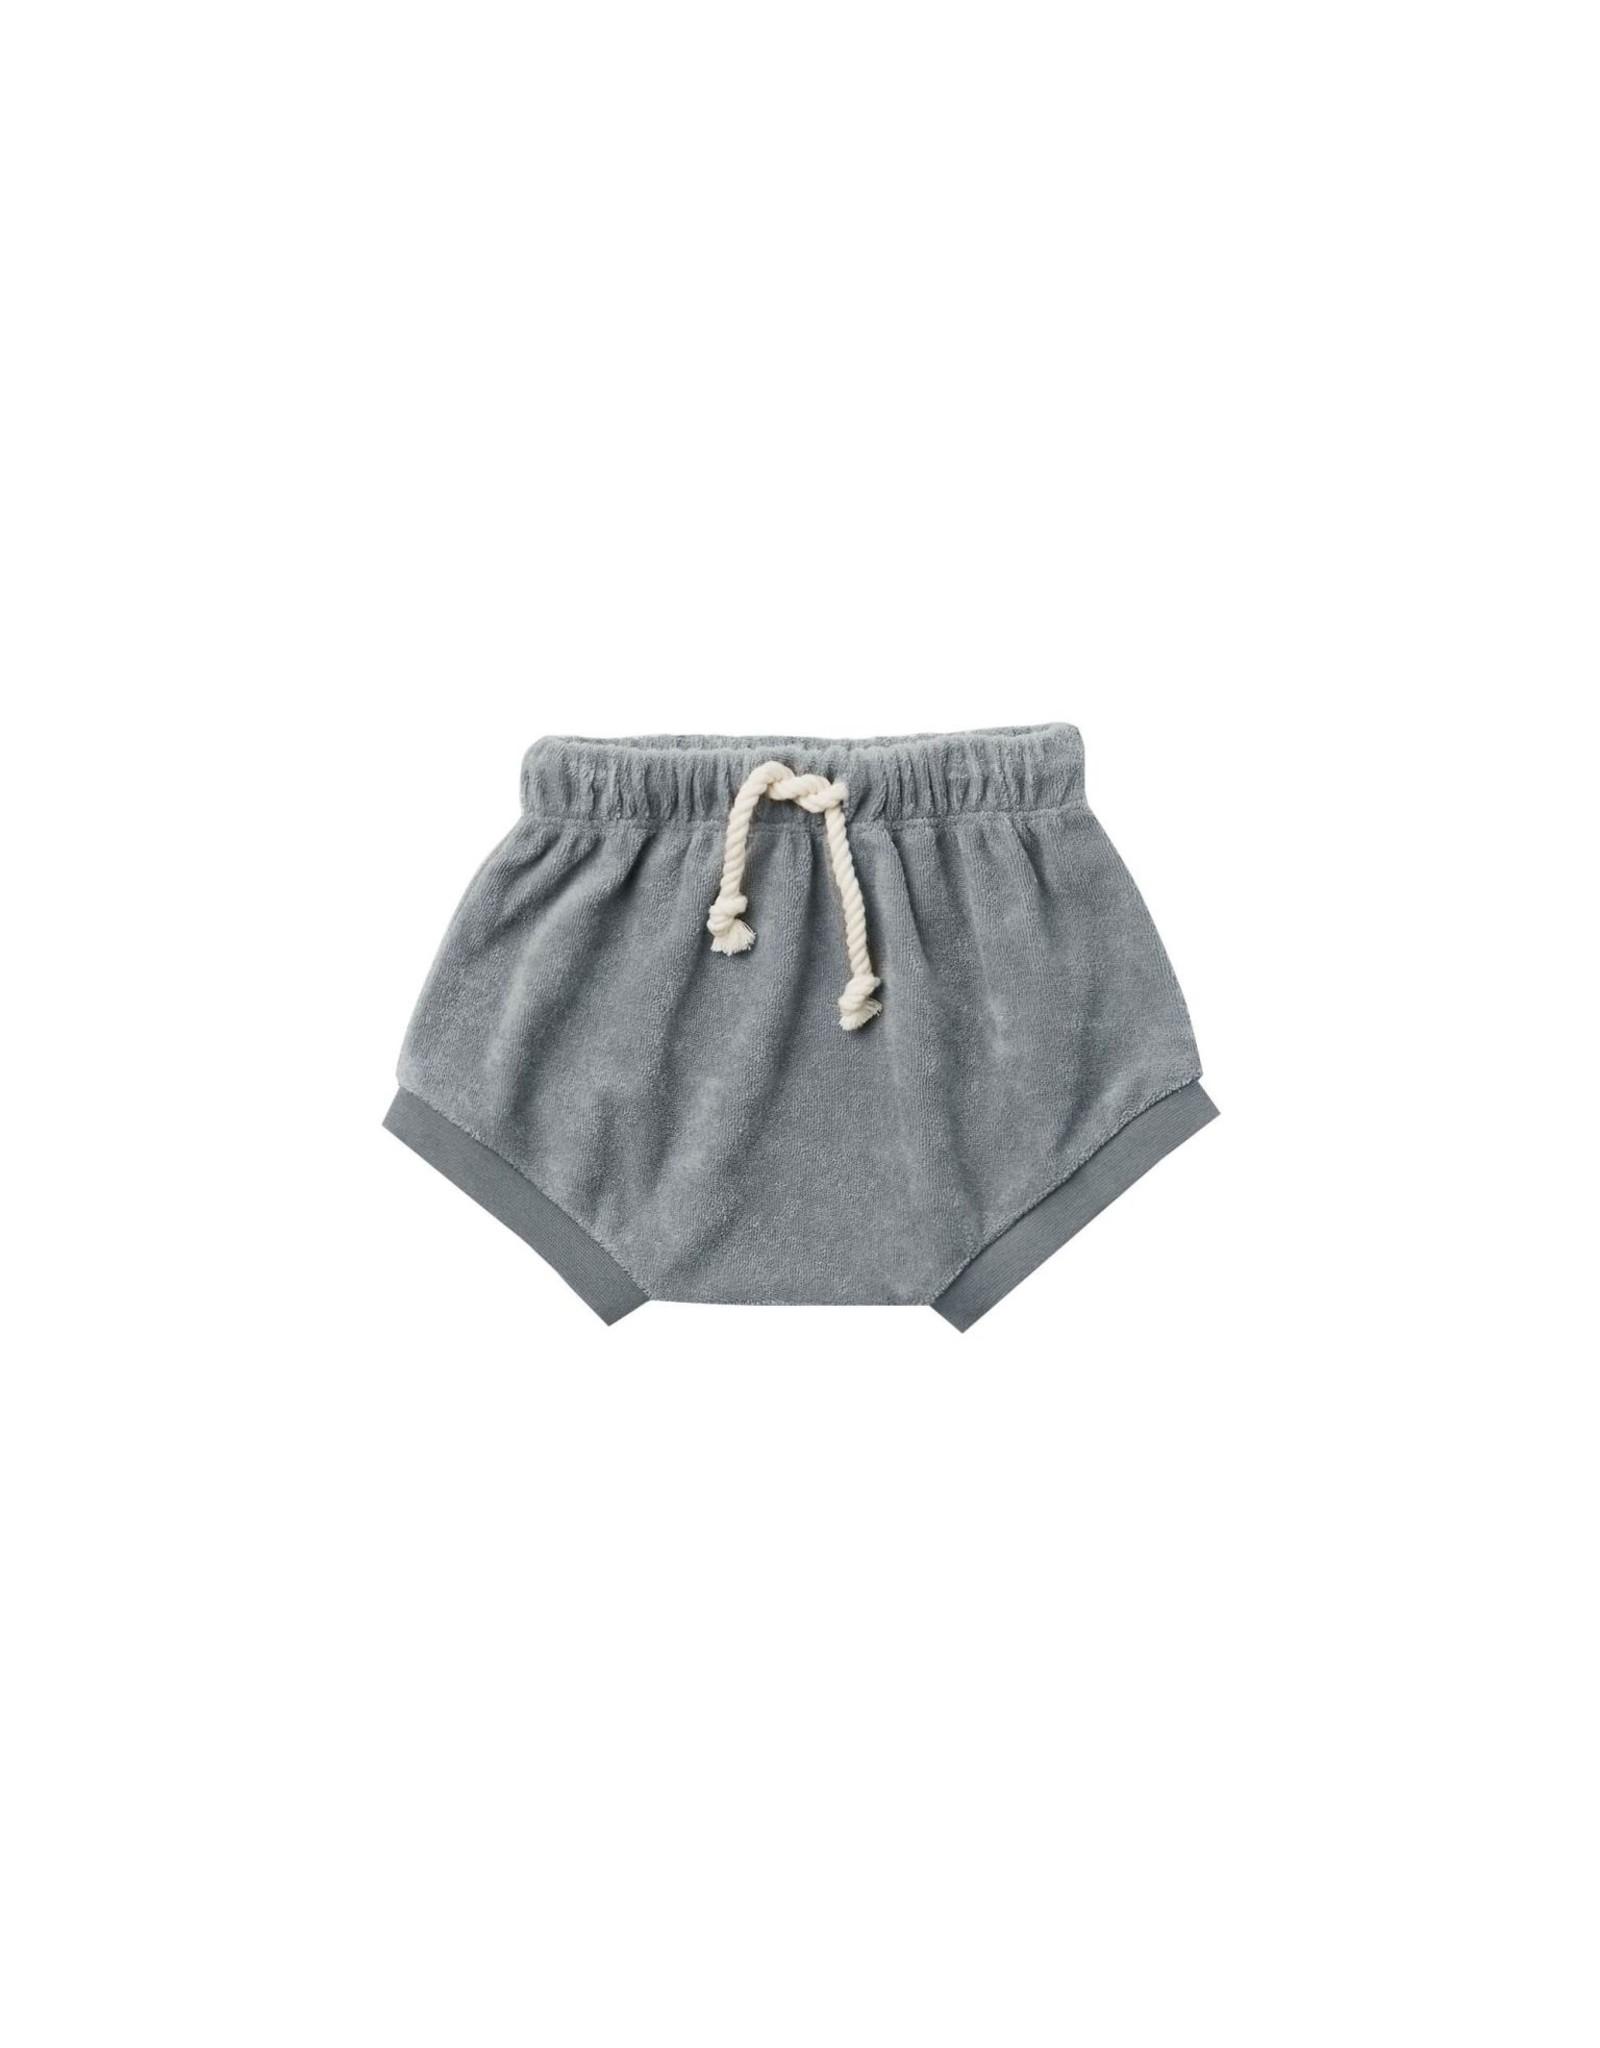 Quincy Mae terry shorts- ocean